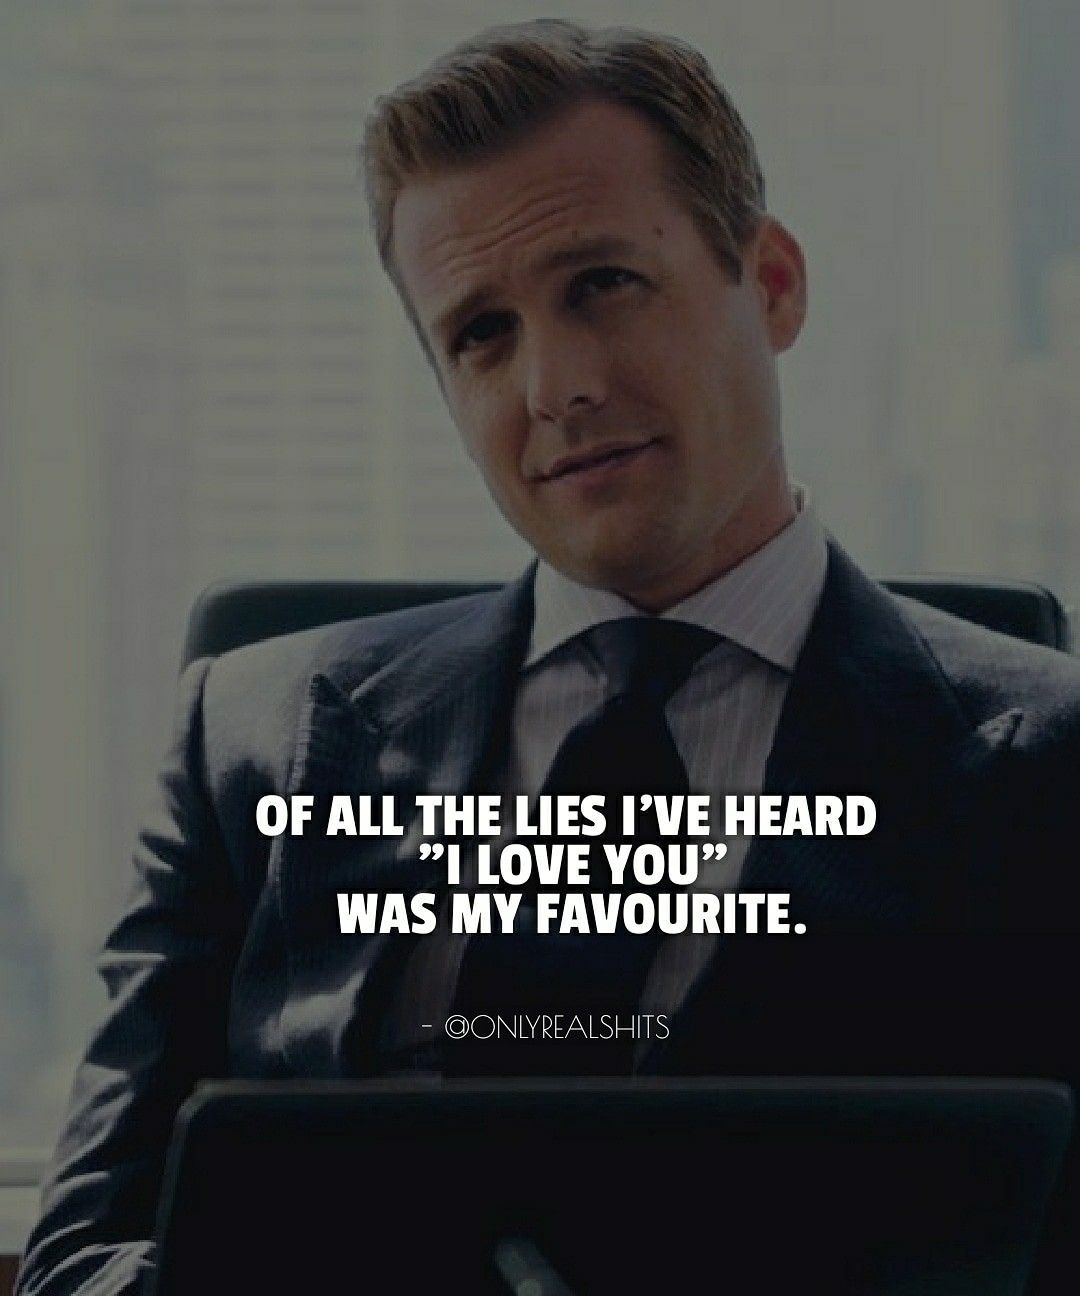 Motivational Quotes Classy Quotes Entrepreneur Motivation Entrepreneur Motivation Classy Quotes Motivational Quotes